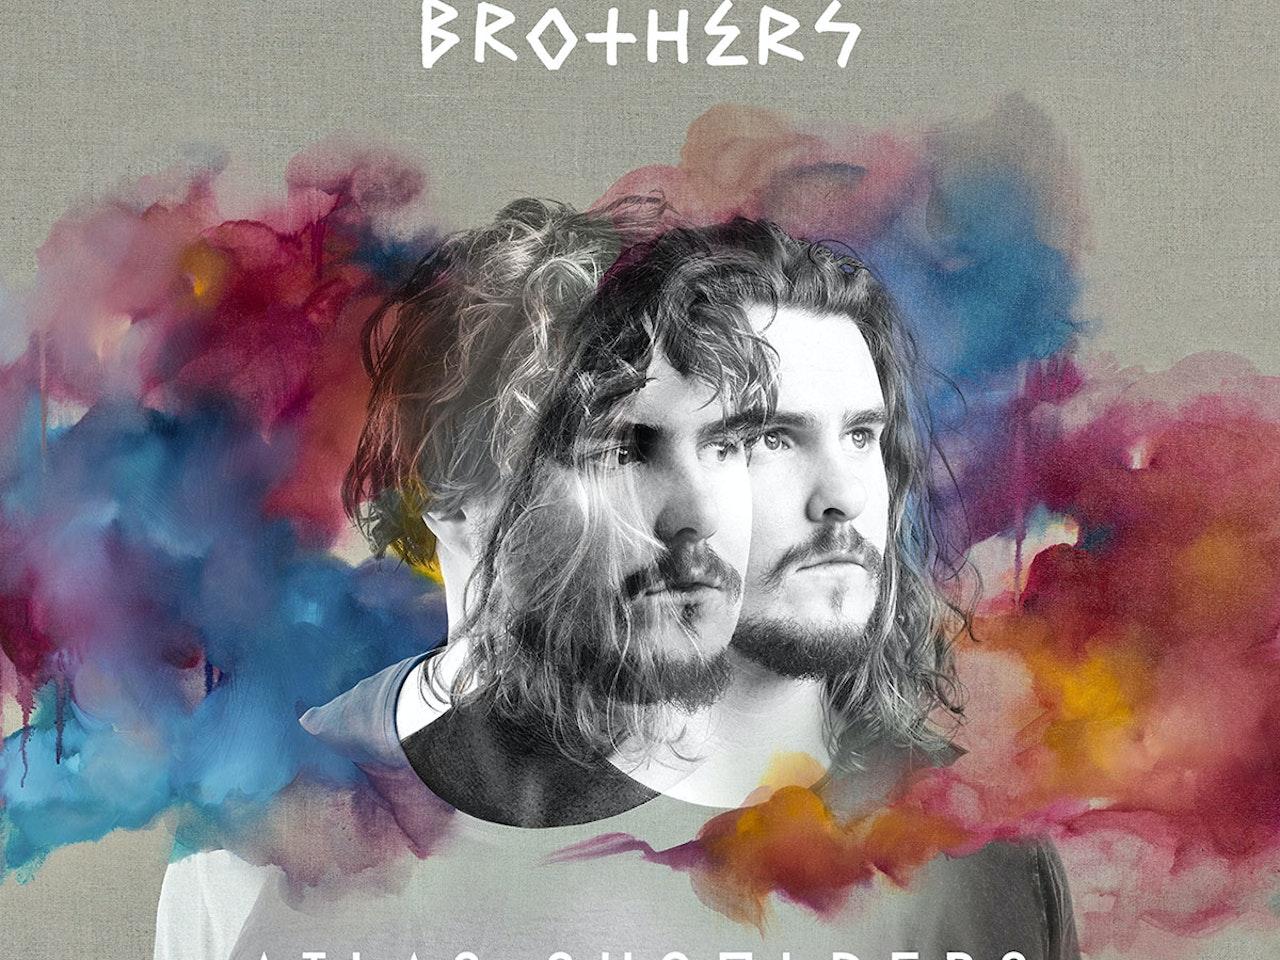 Pierce_Brothers_Album_art